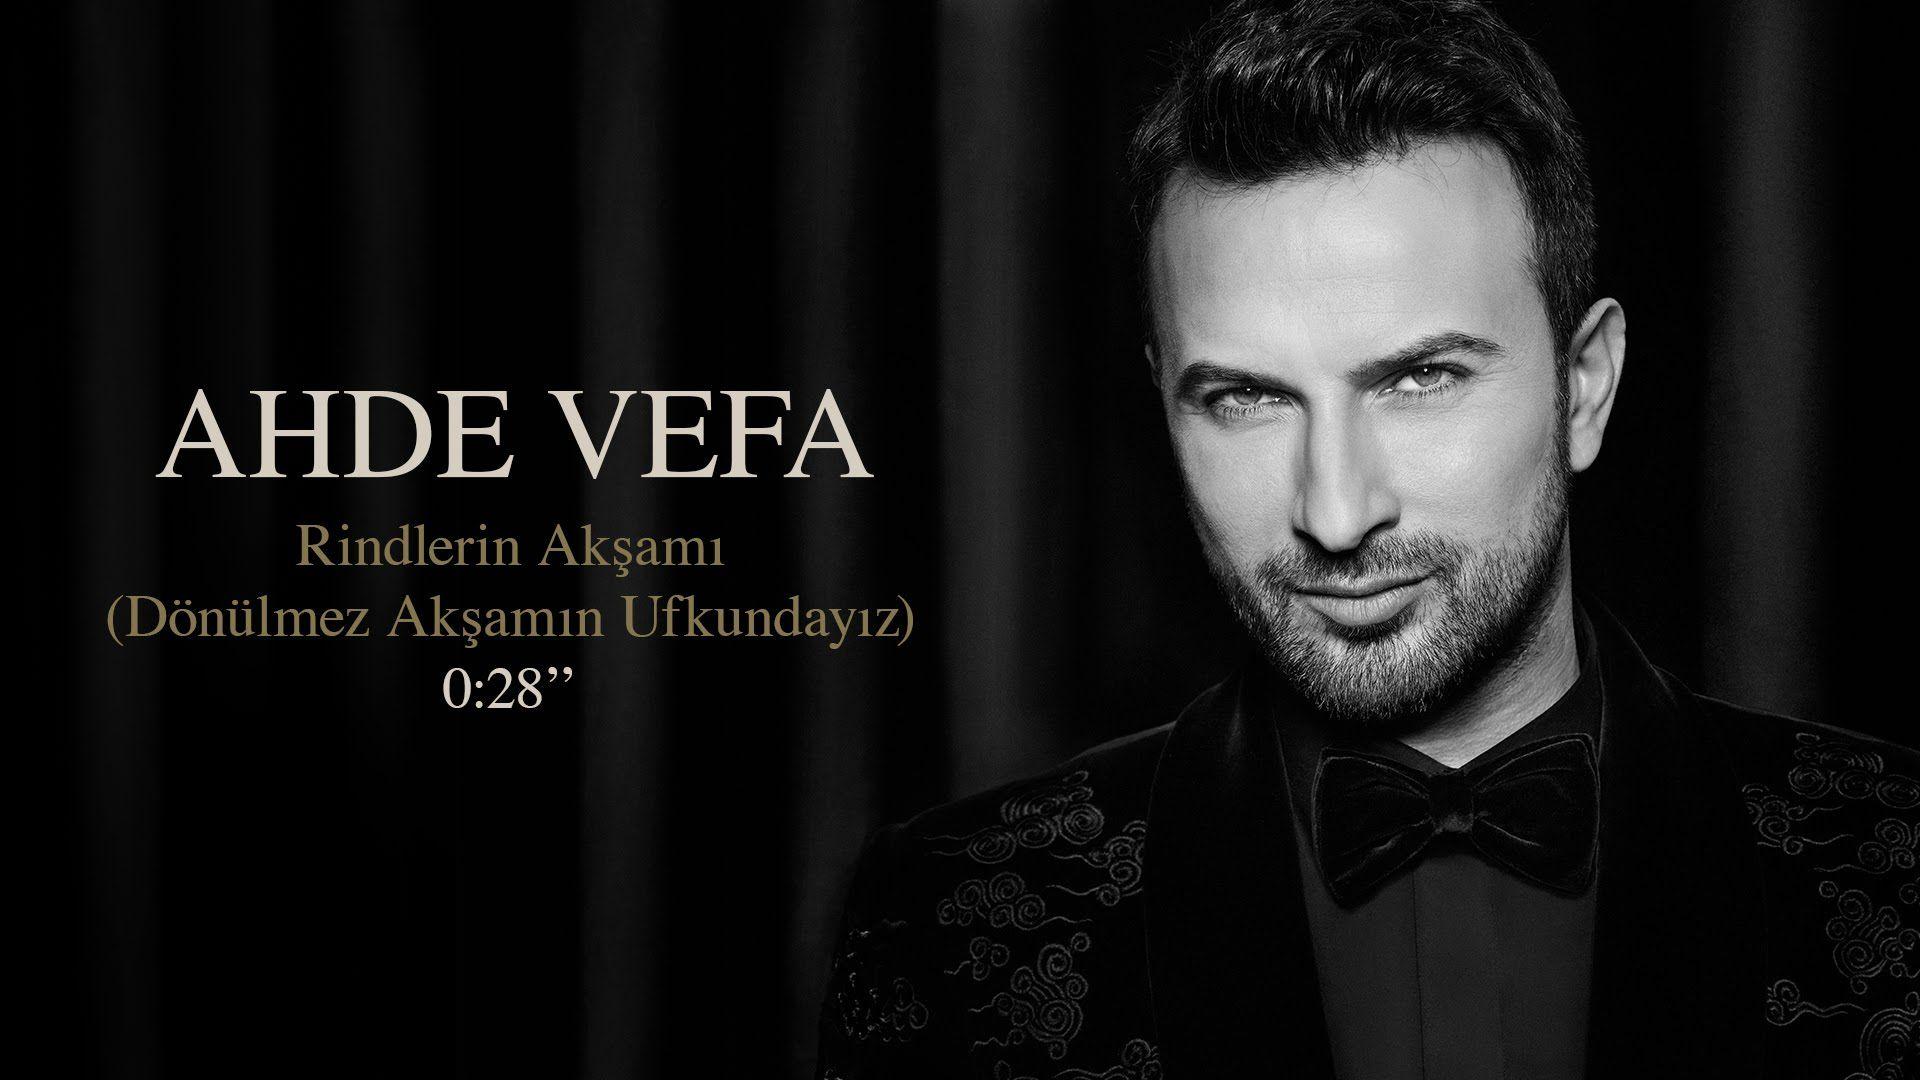 Tarkan Ahde Vefa Albumu Alaturka Online Op Beni Sarkilar Muzik